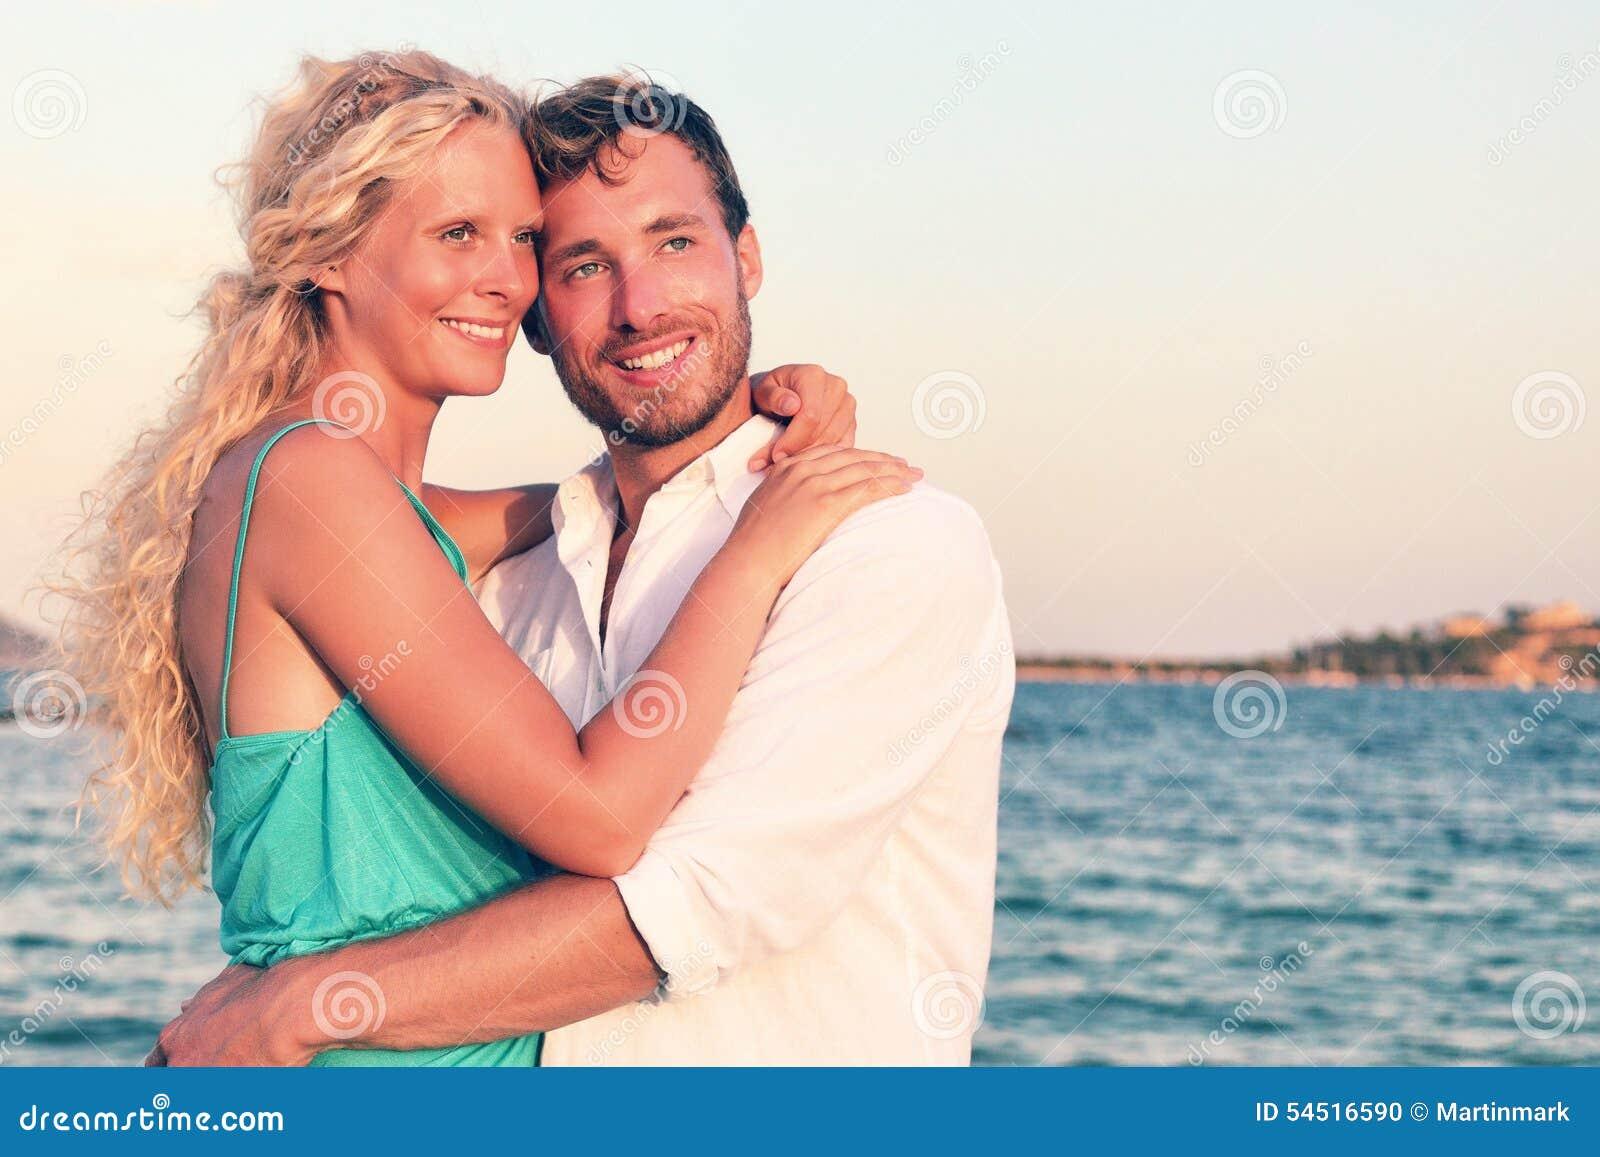 Romantic couple in love enjoying sunset at beach